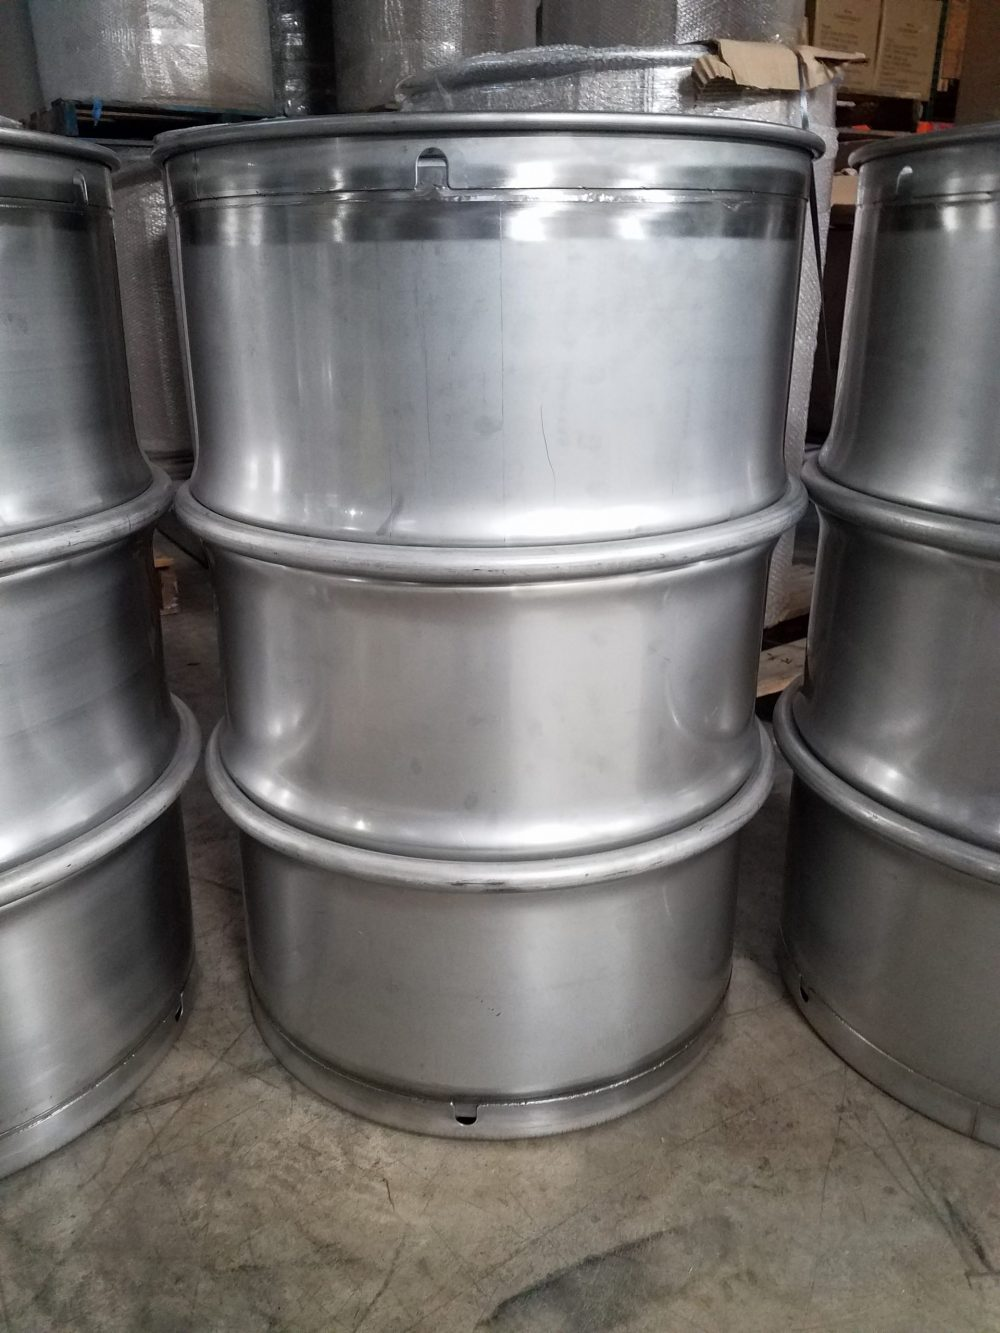 Nitric acid stainless steel drums